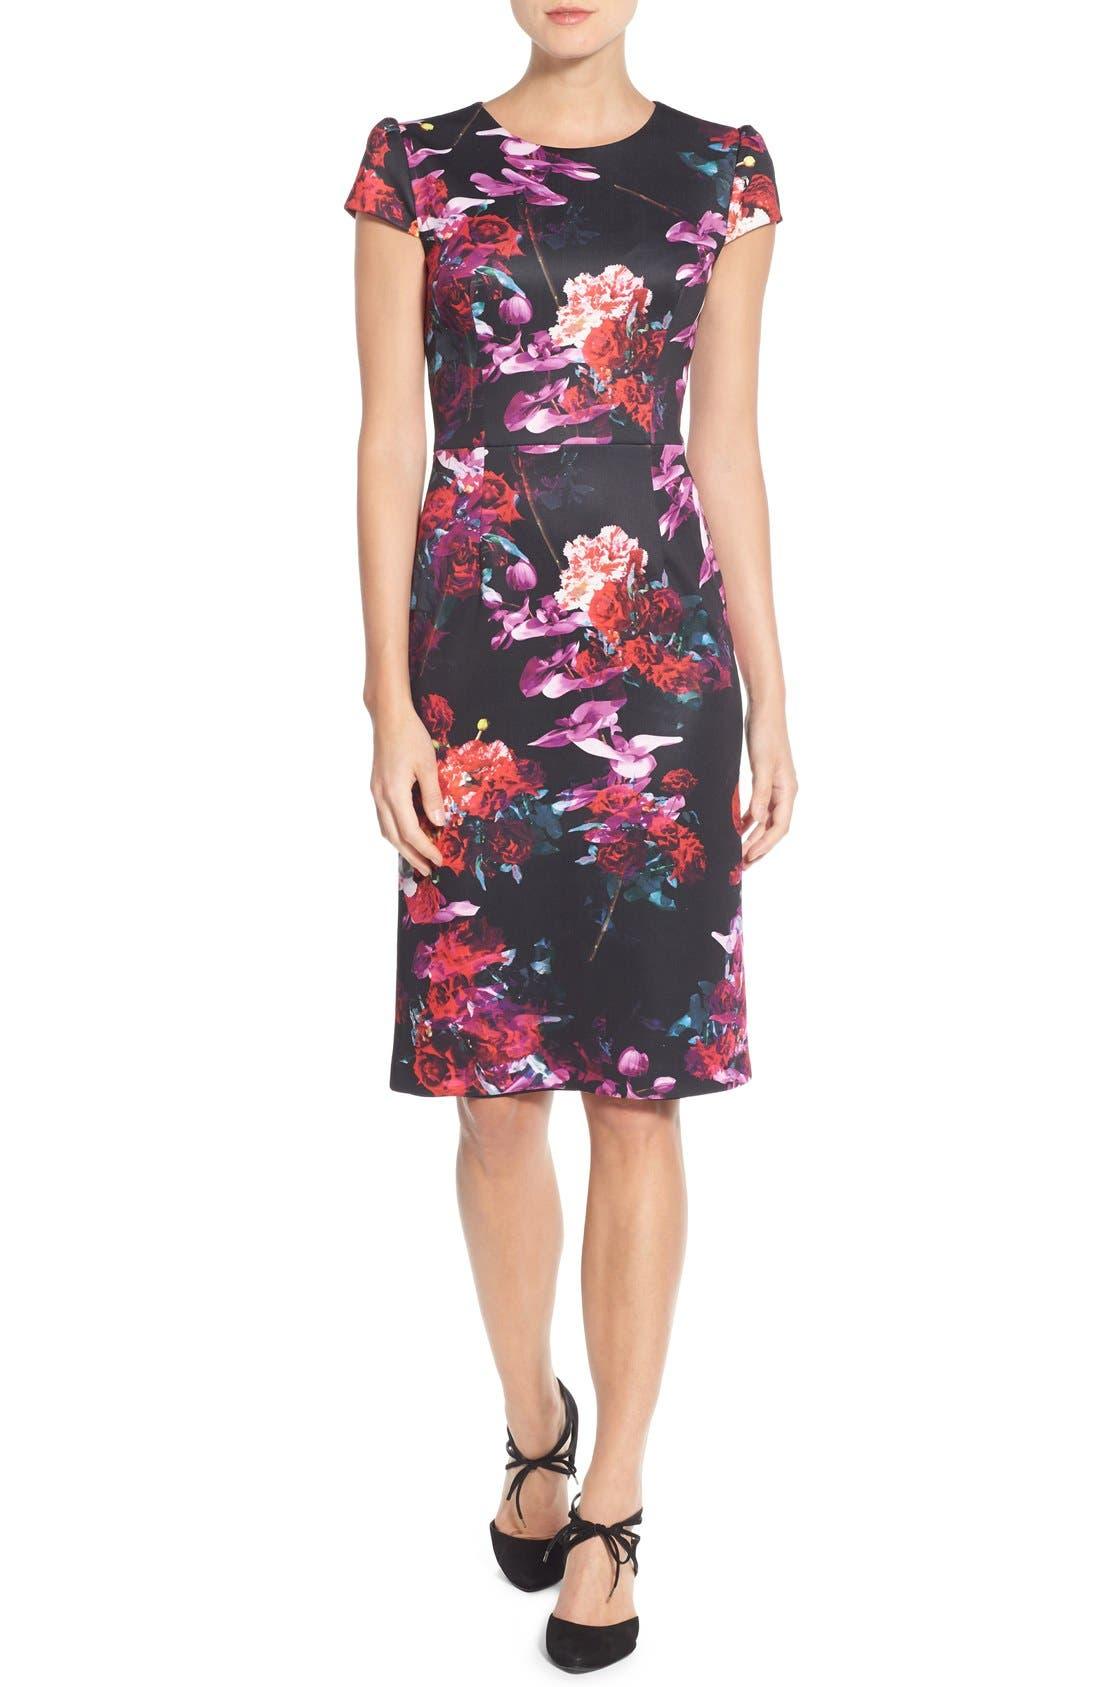 Floral Print Knit Sheath Dress,                         Main,                         color, Black/ Purple Multi